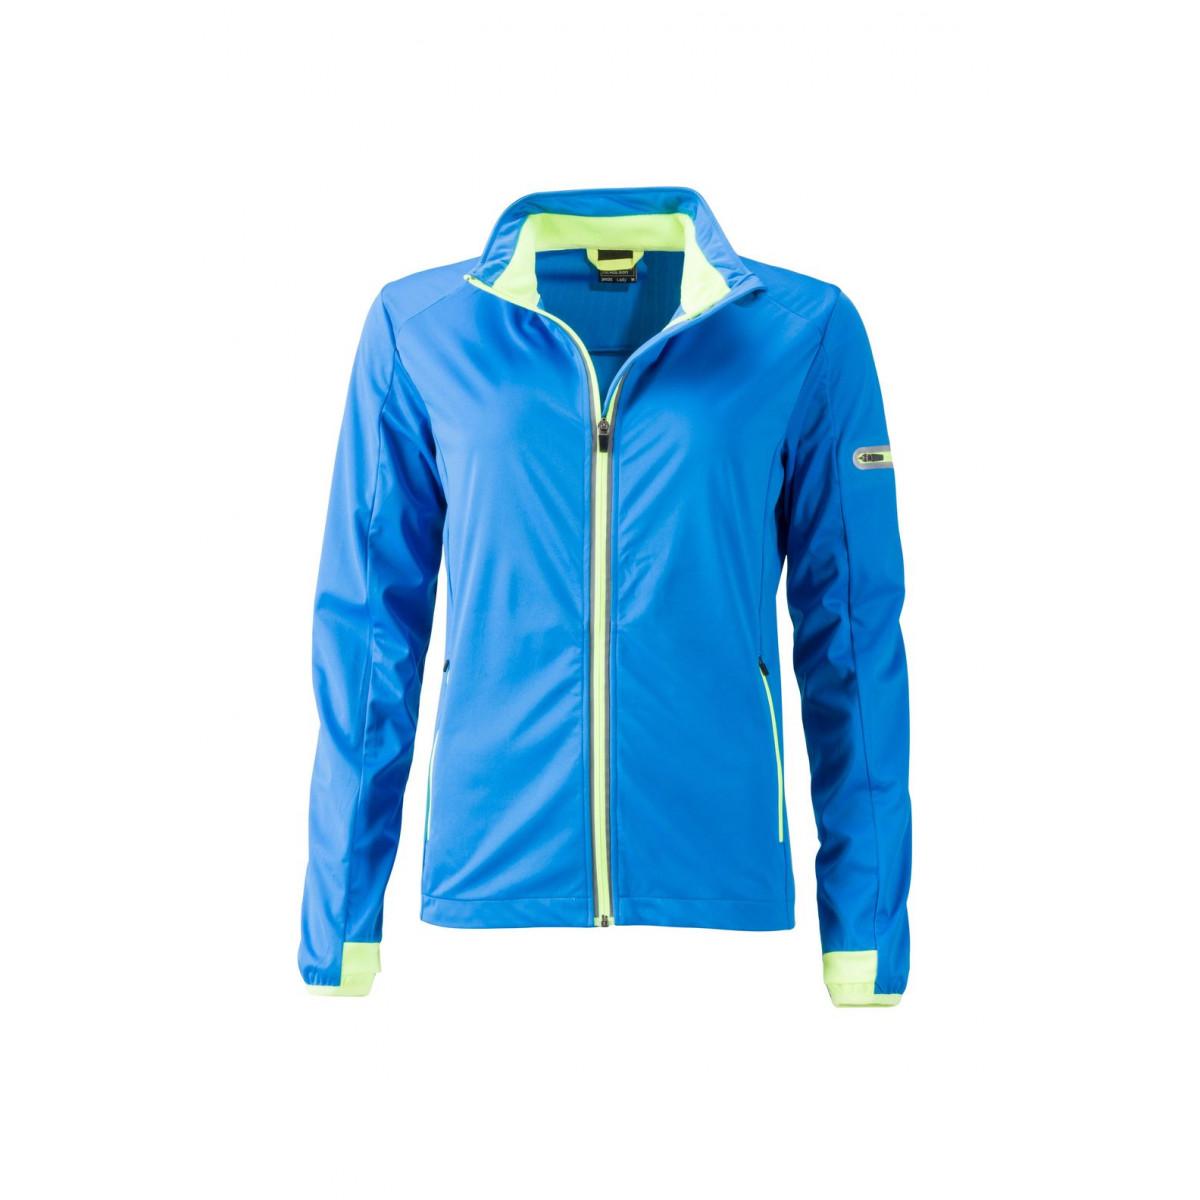 Куртка женская JN1125 Ladies Sports Softshell Jacket - Ярко-синий/Ярко-желтый